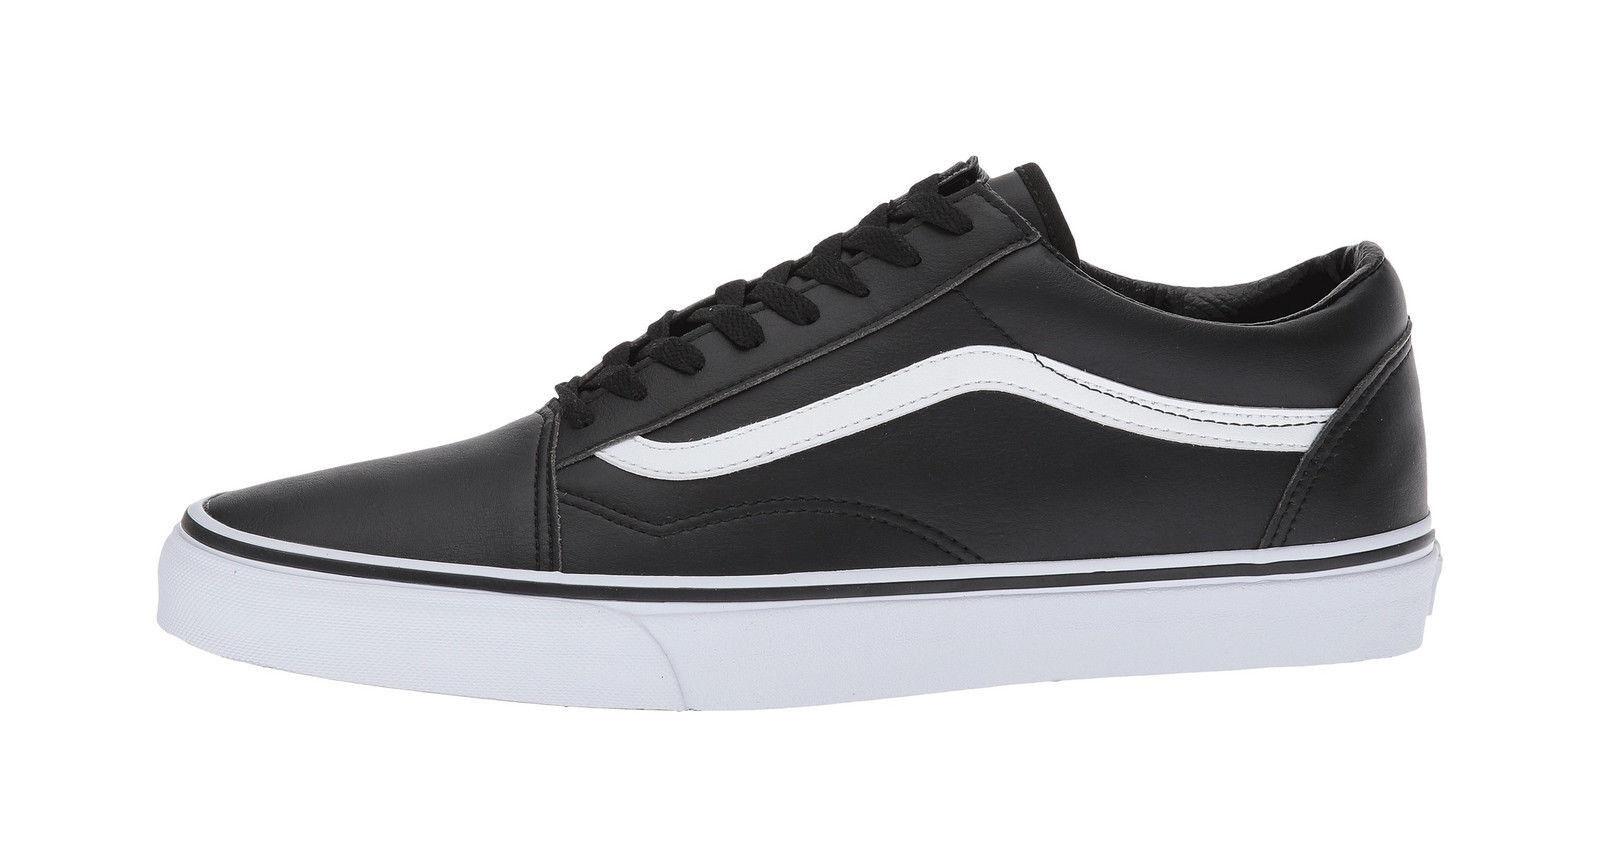 Vans Men Unisex Women shoes Old Skool Classic Tumble Leather (Synthetic) Black